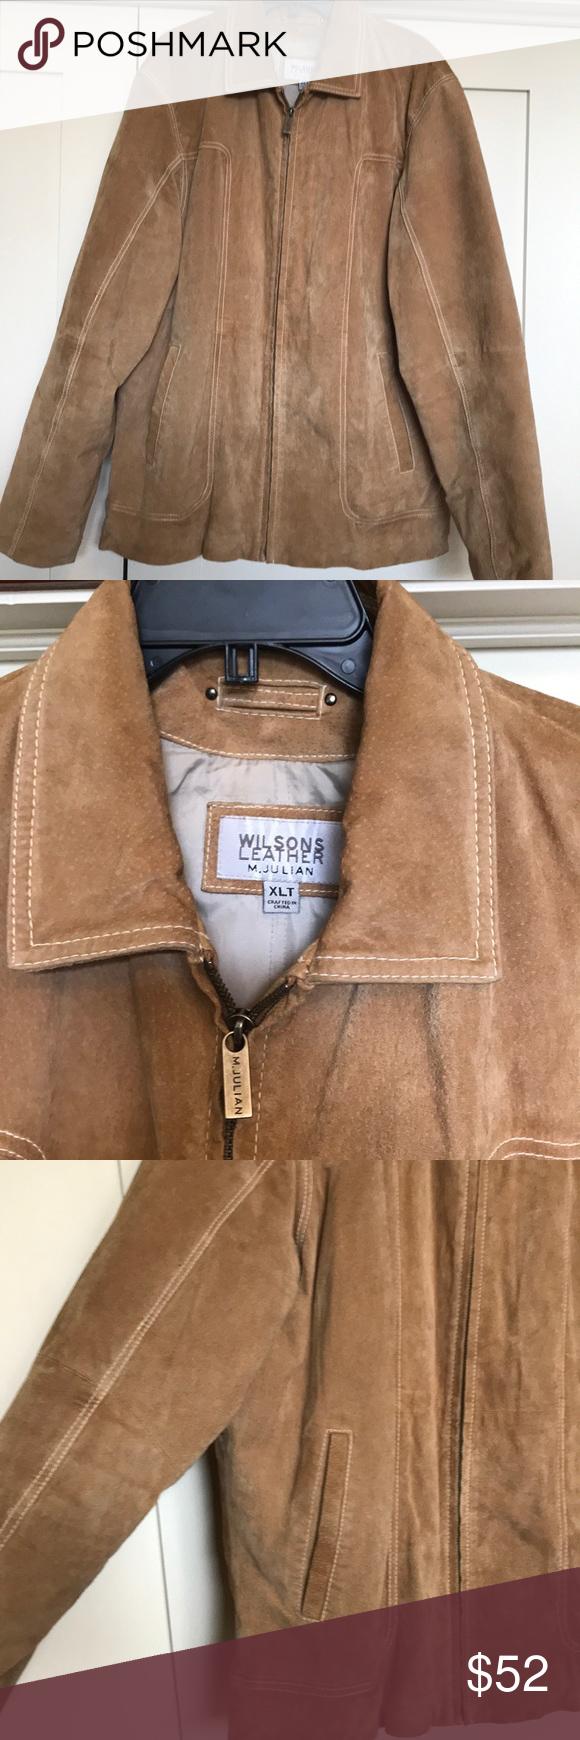 Wilson's M JULIAN Tan Suede Leather Jacket EUC Very clean